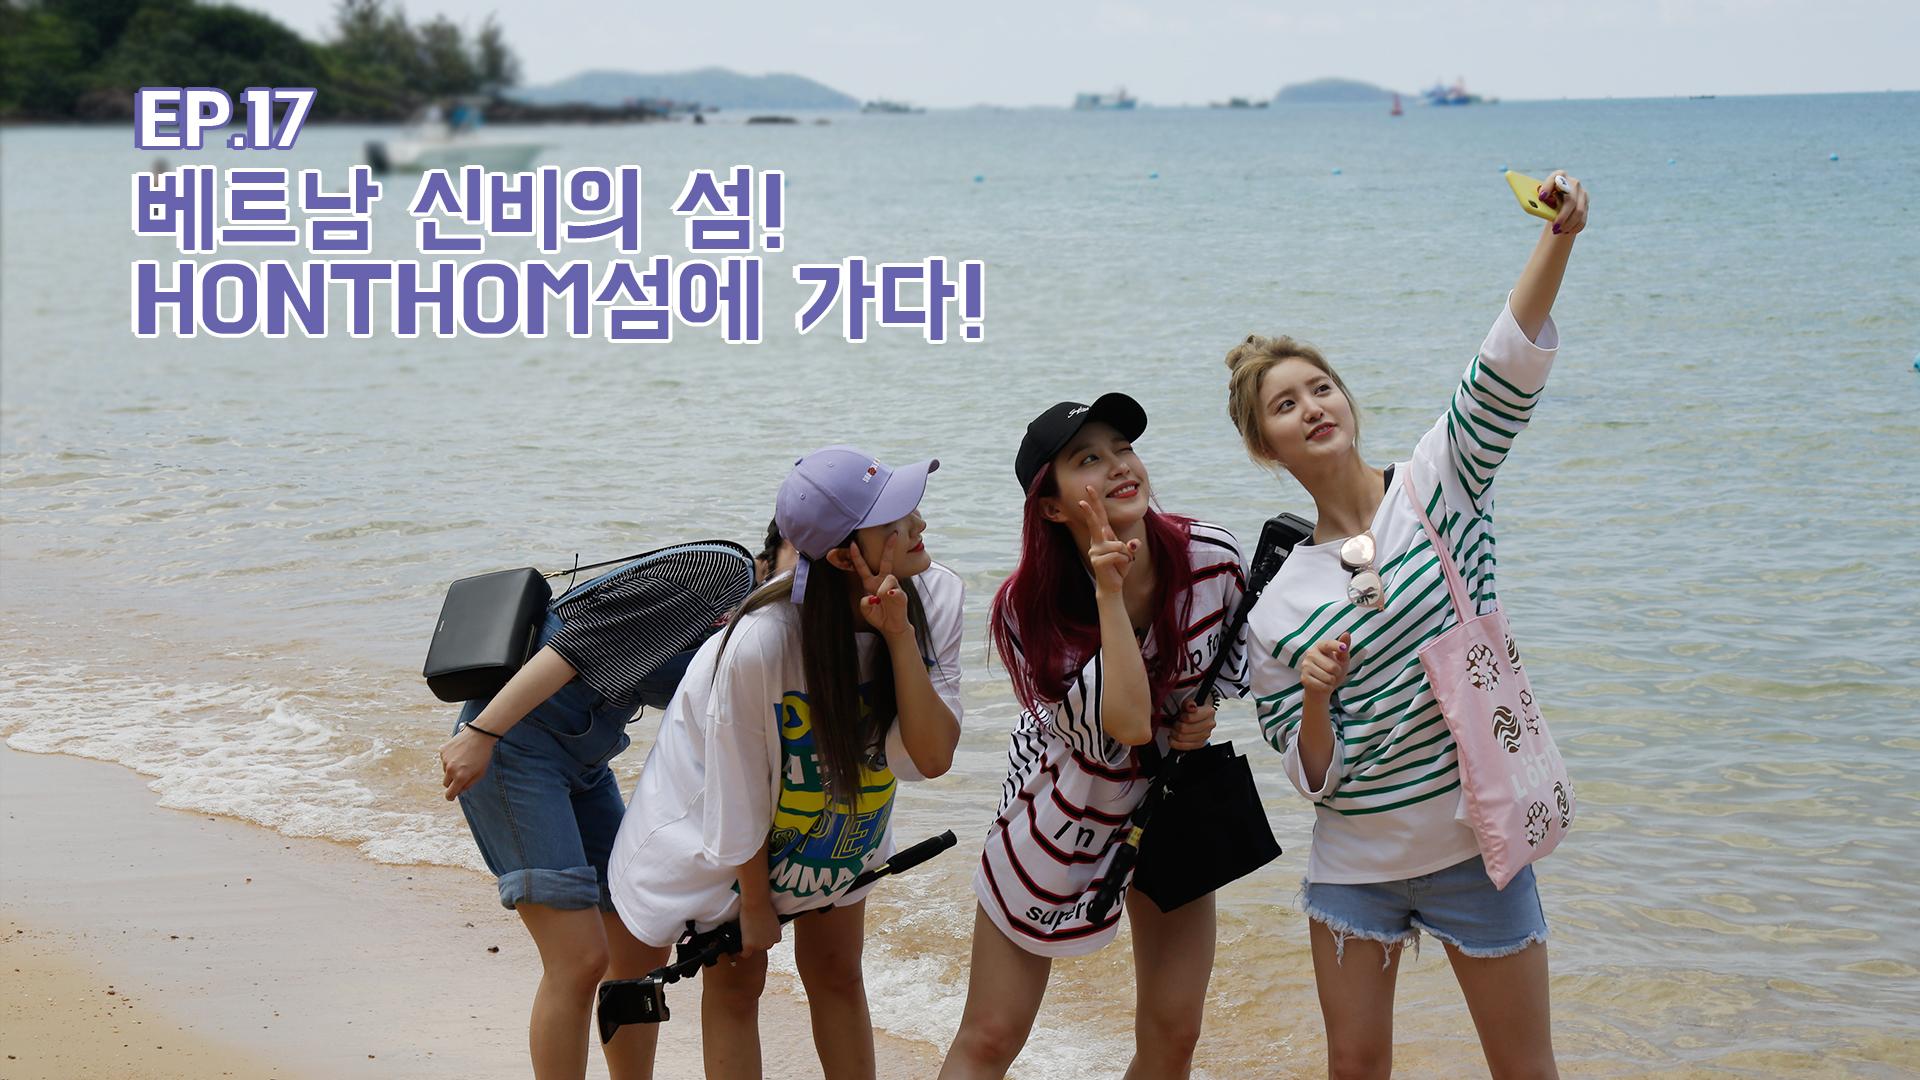 [MADE IN EXID] EXID EP17. 베트남 신비의 섬! HONTHOM섬에 가다!